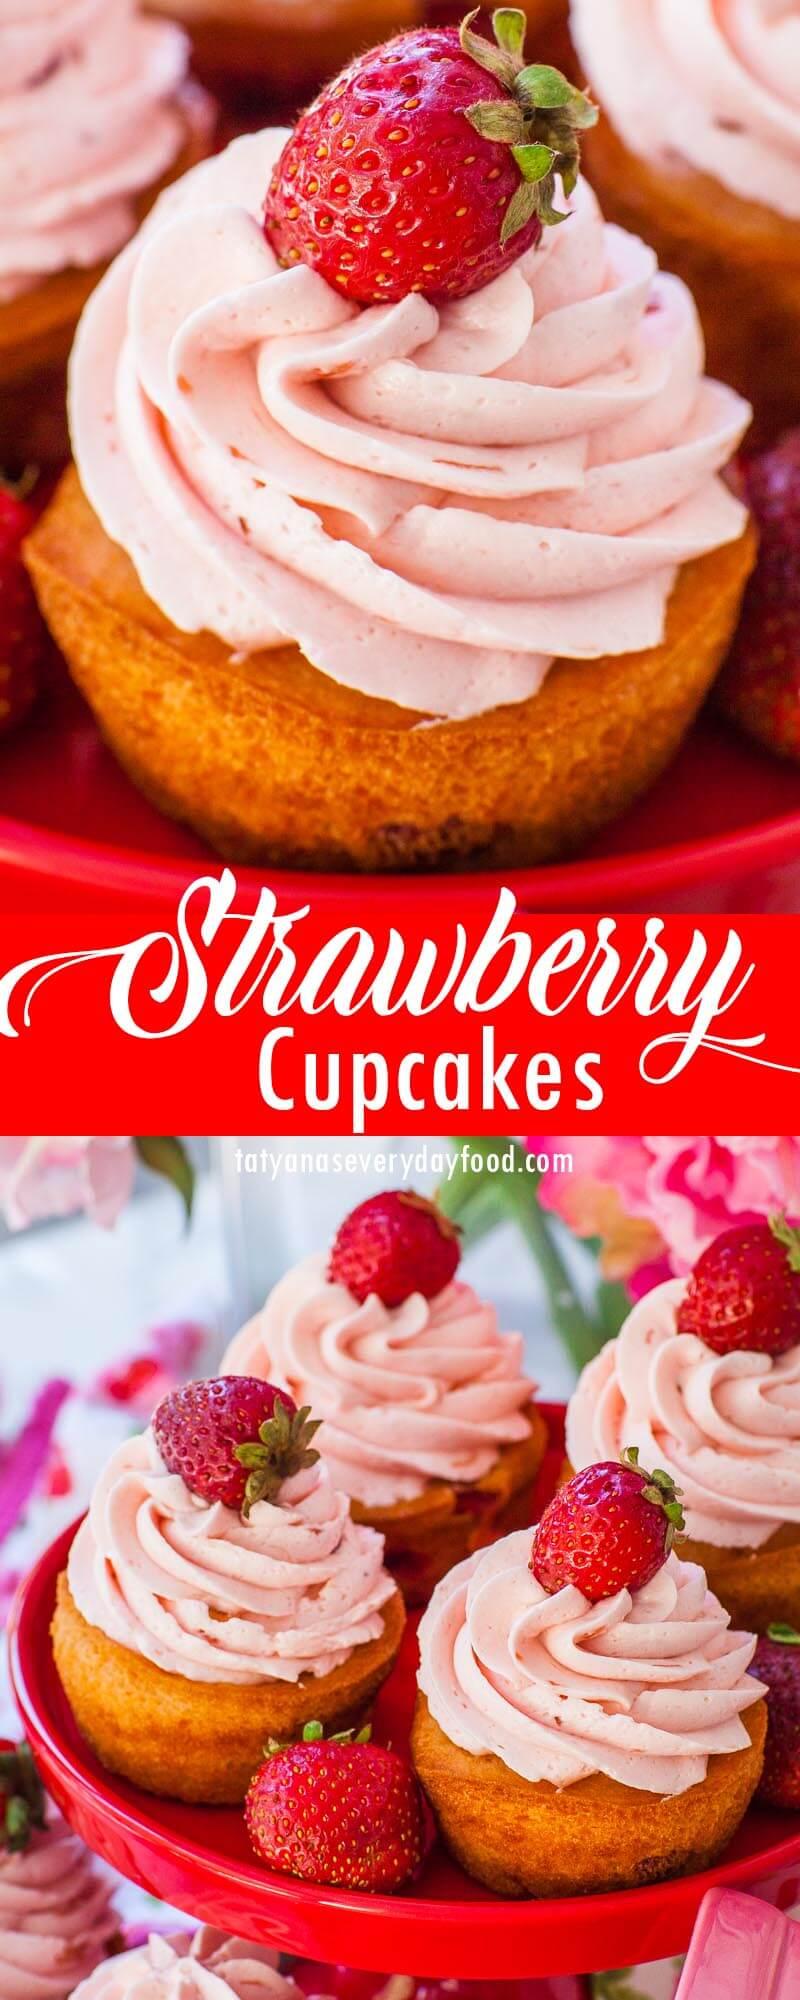 Easy Strawberry Cupcakes video recipe